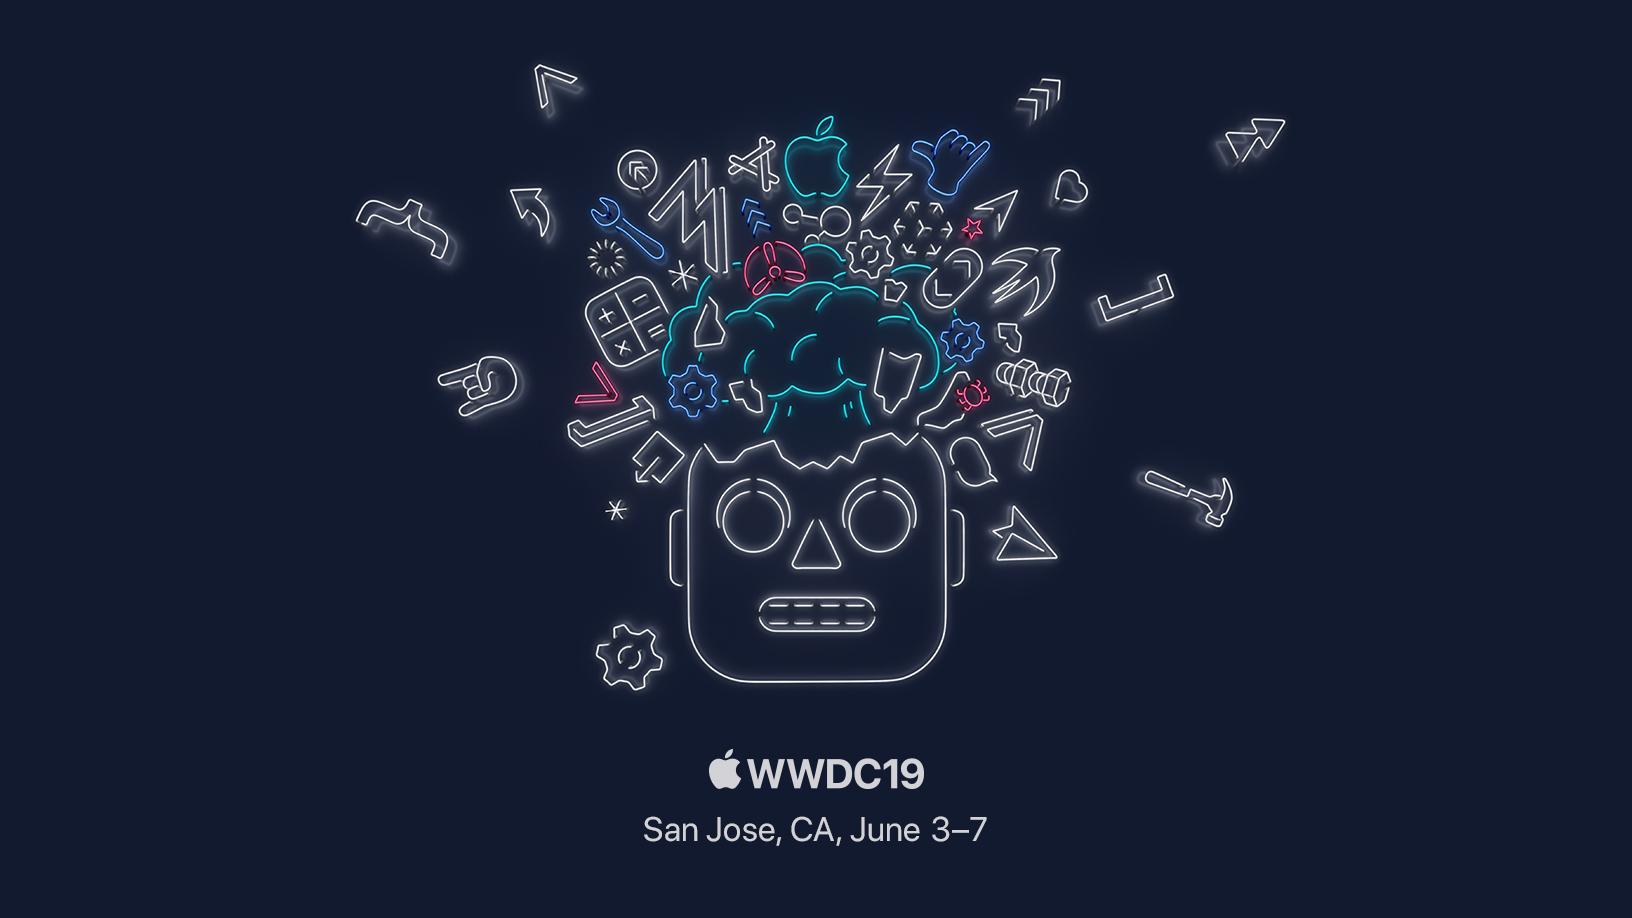 https://www.apple.com/newsroom/images/live-action/wwdc/Apple-WWDC-2019-03142019_big.jpg.large_2x.jpg